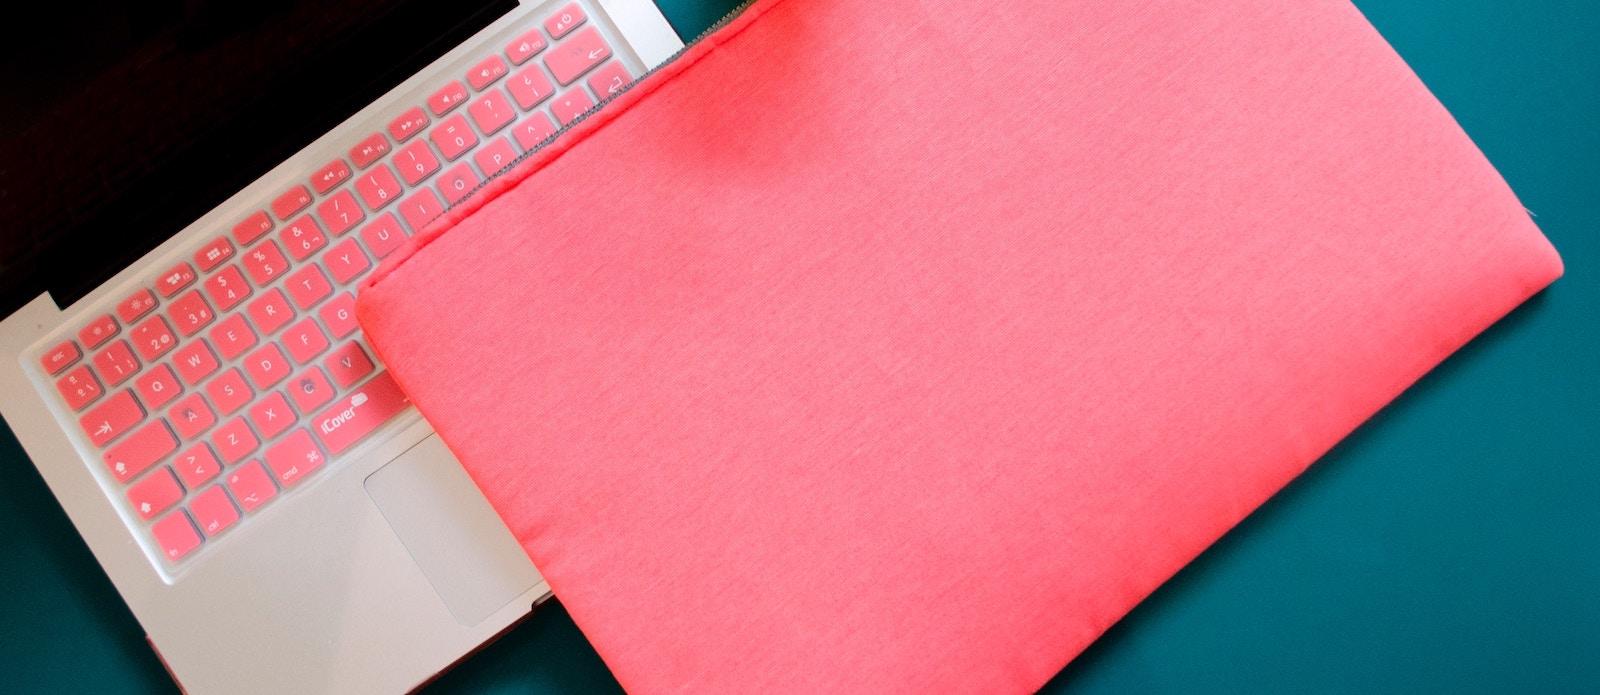 Notebook & PC